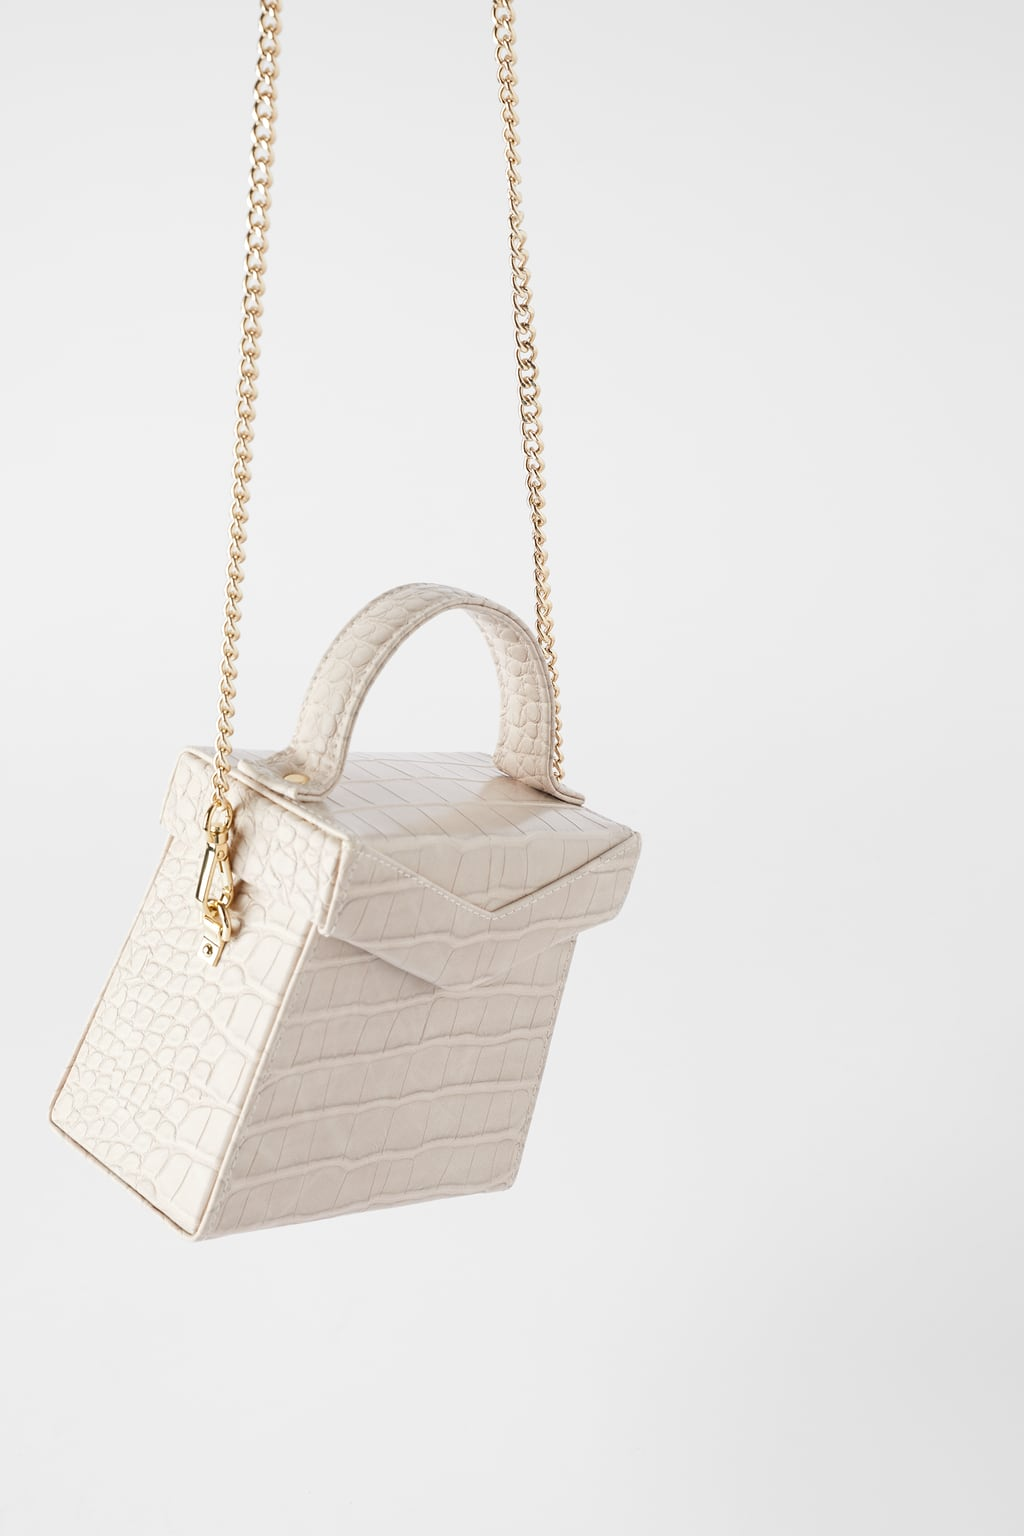 tiny bags